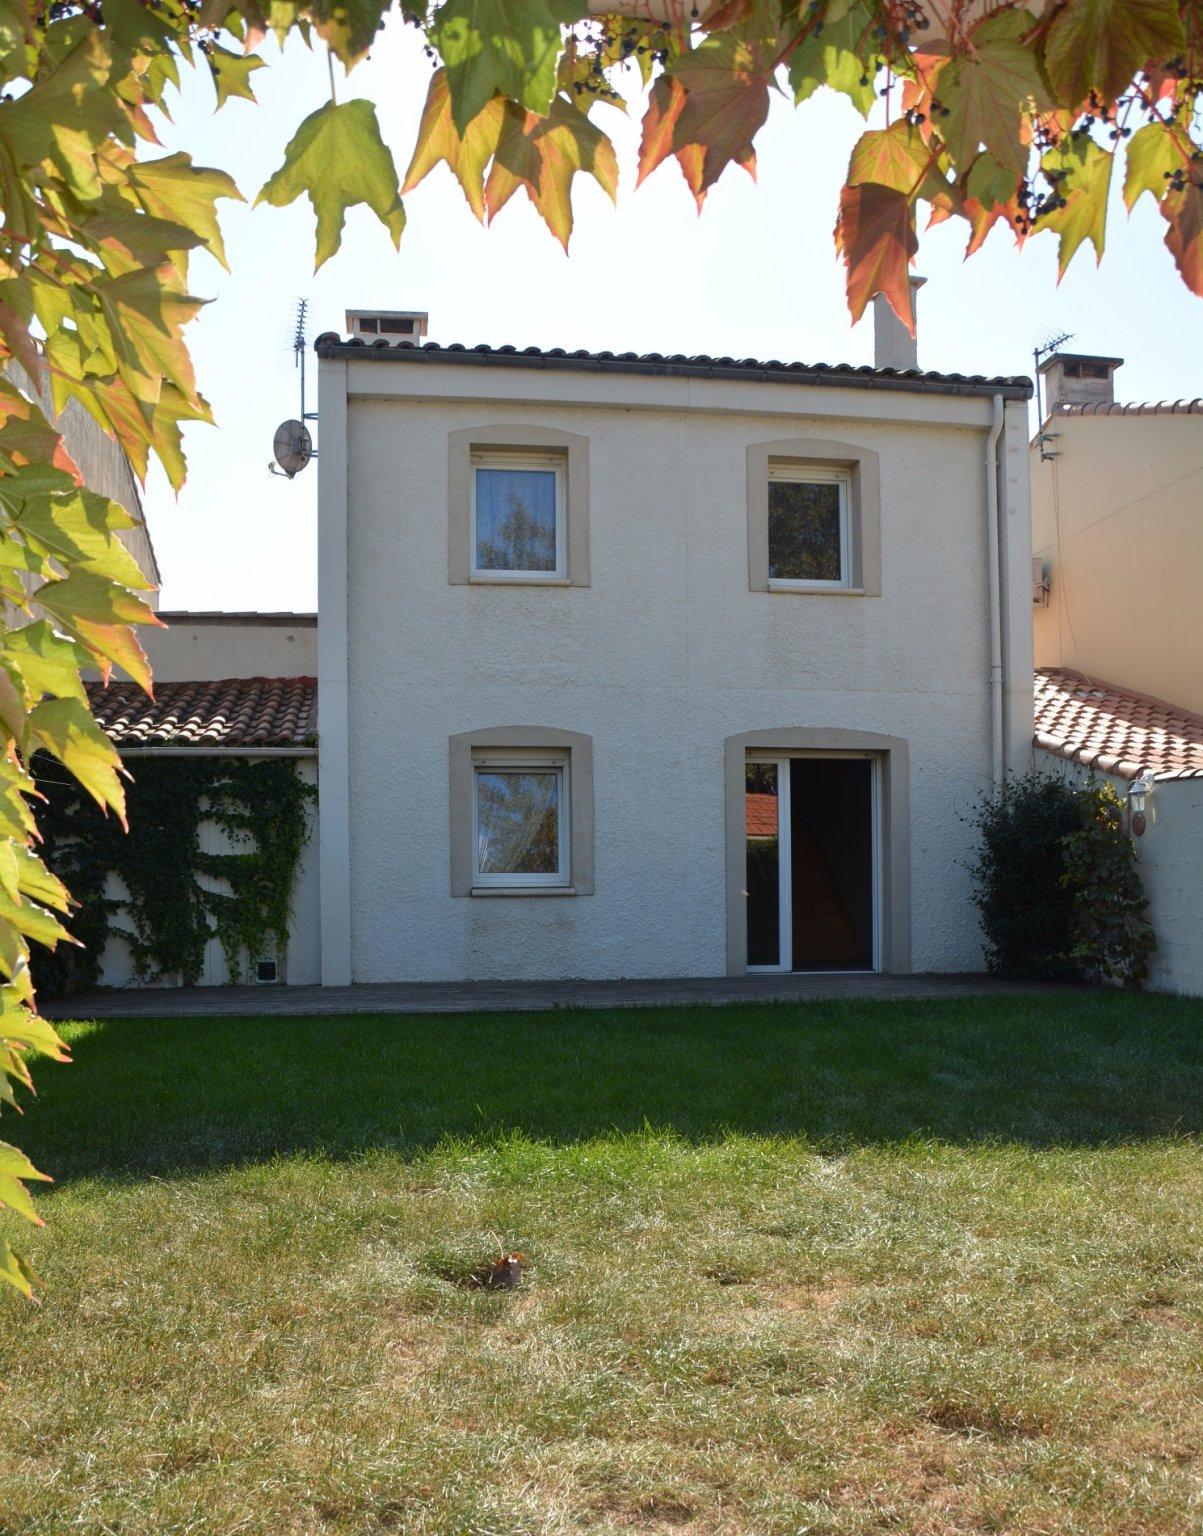 Maison CARCASSONNAIS | 149 500 €